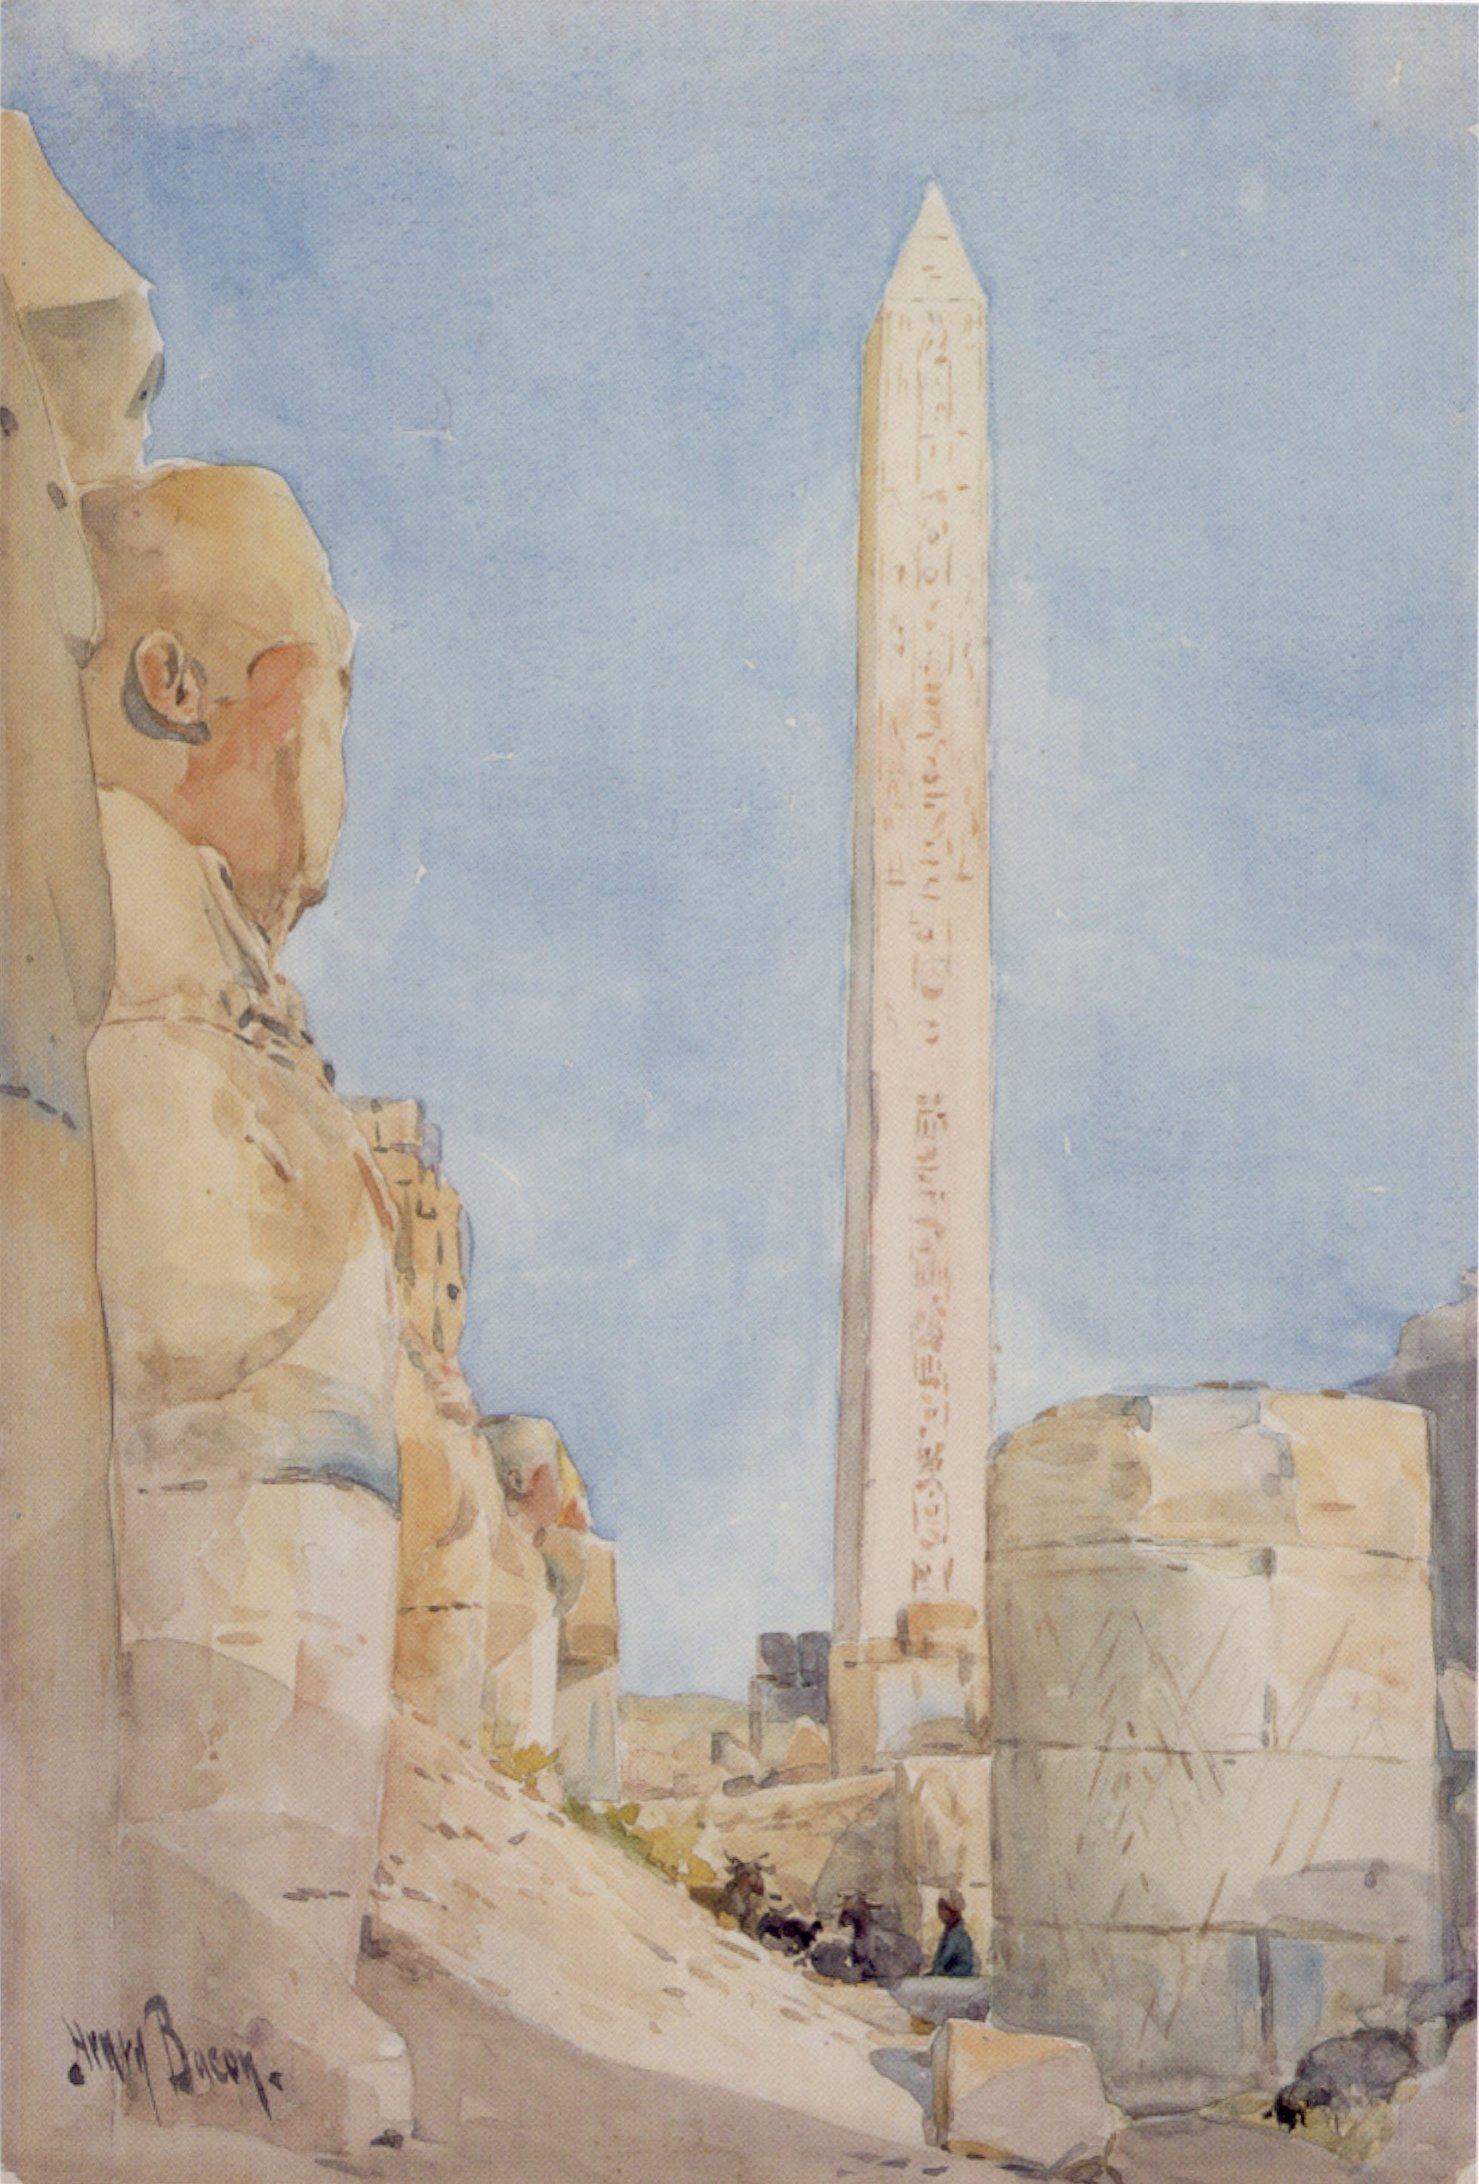 https://i0.wp.com/upload.wikimedia.org/wikipedia/commons/9/9e/Henry_A._Bacon_-_%27Obelisk--Karnak_in_1900%27,_watercolor_over_graphite_by_Henry_A._Bacon,_1900.jpg